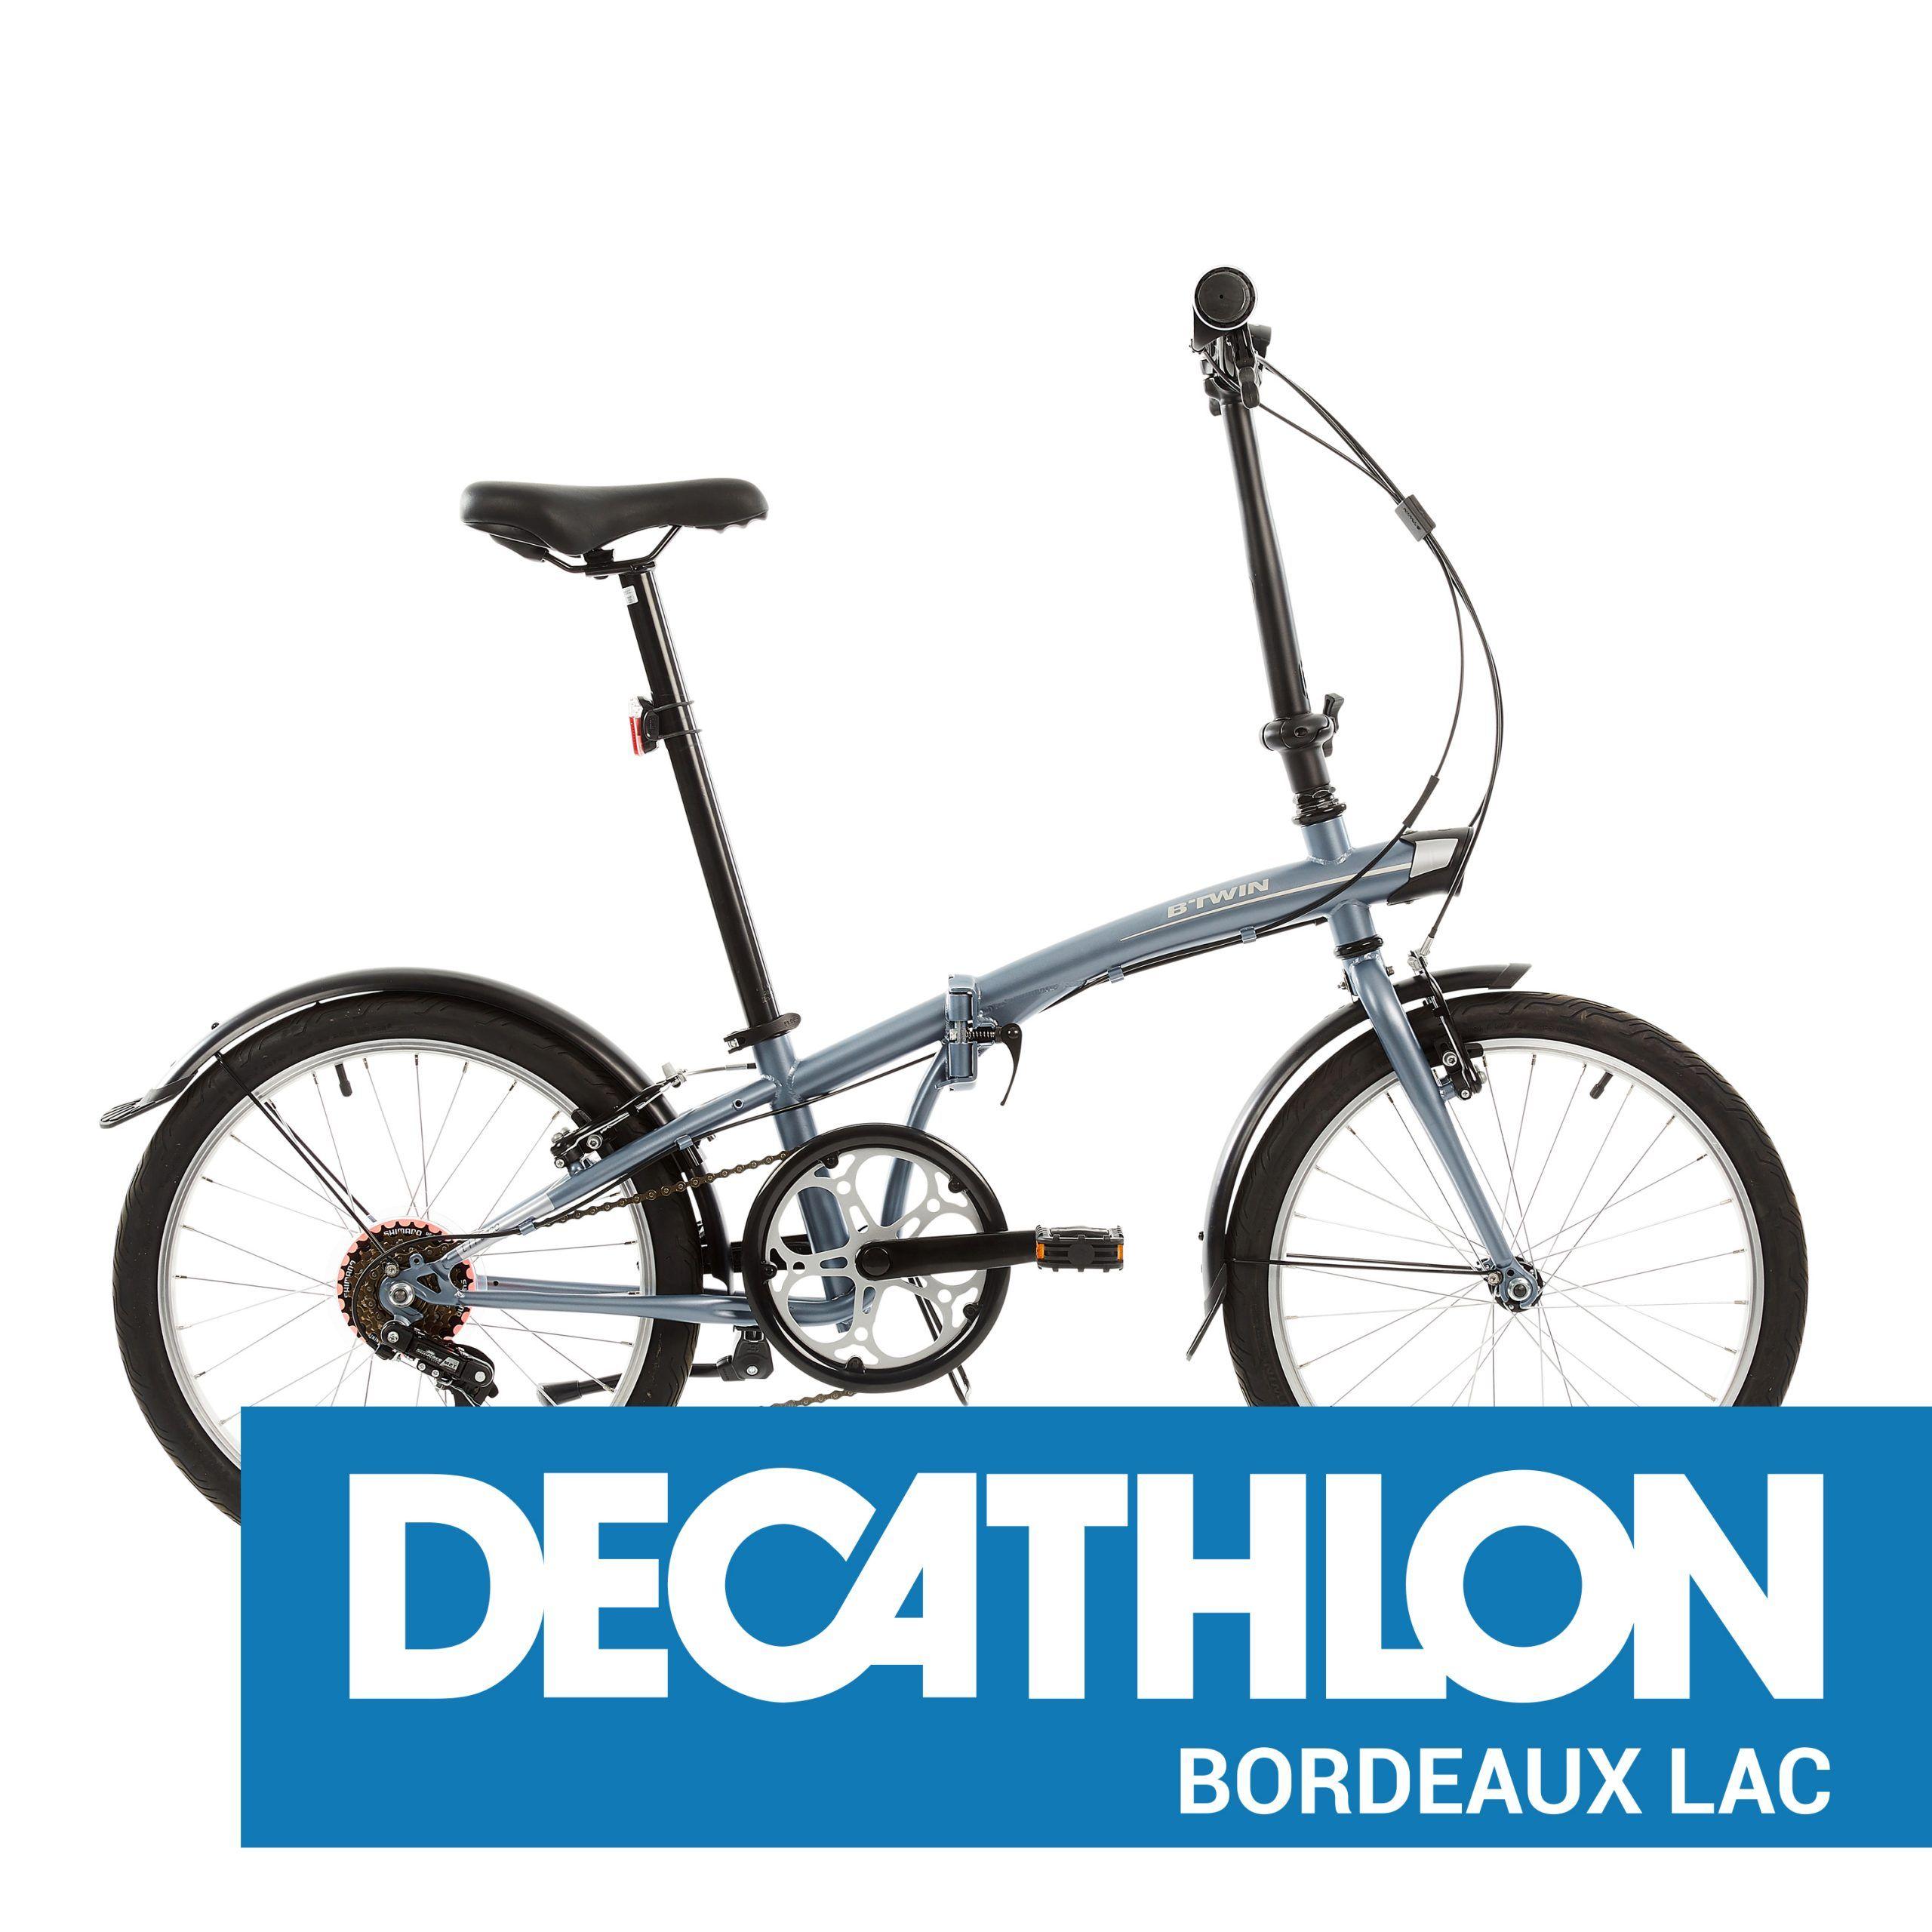 Decathlon Bordeaux Lac Location Velo Pliant Tilt 120 En 2020 Velo Pliant Camping Car Decathlon